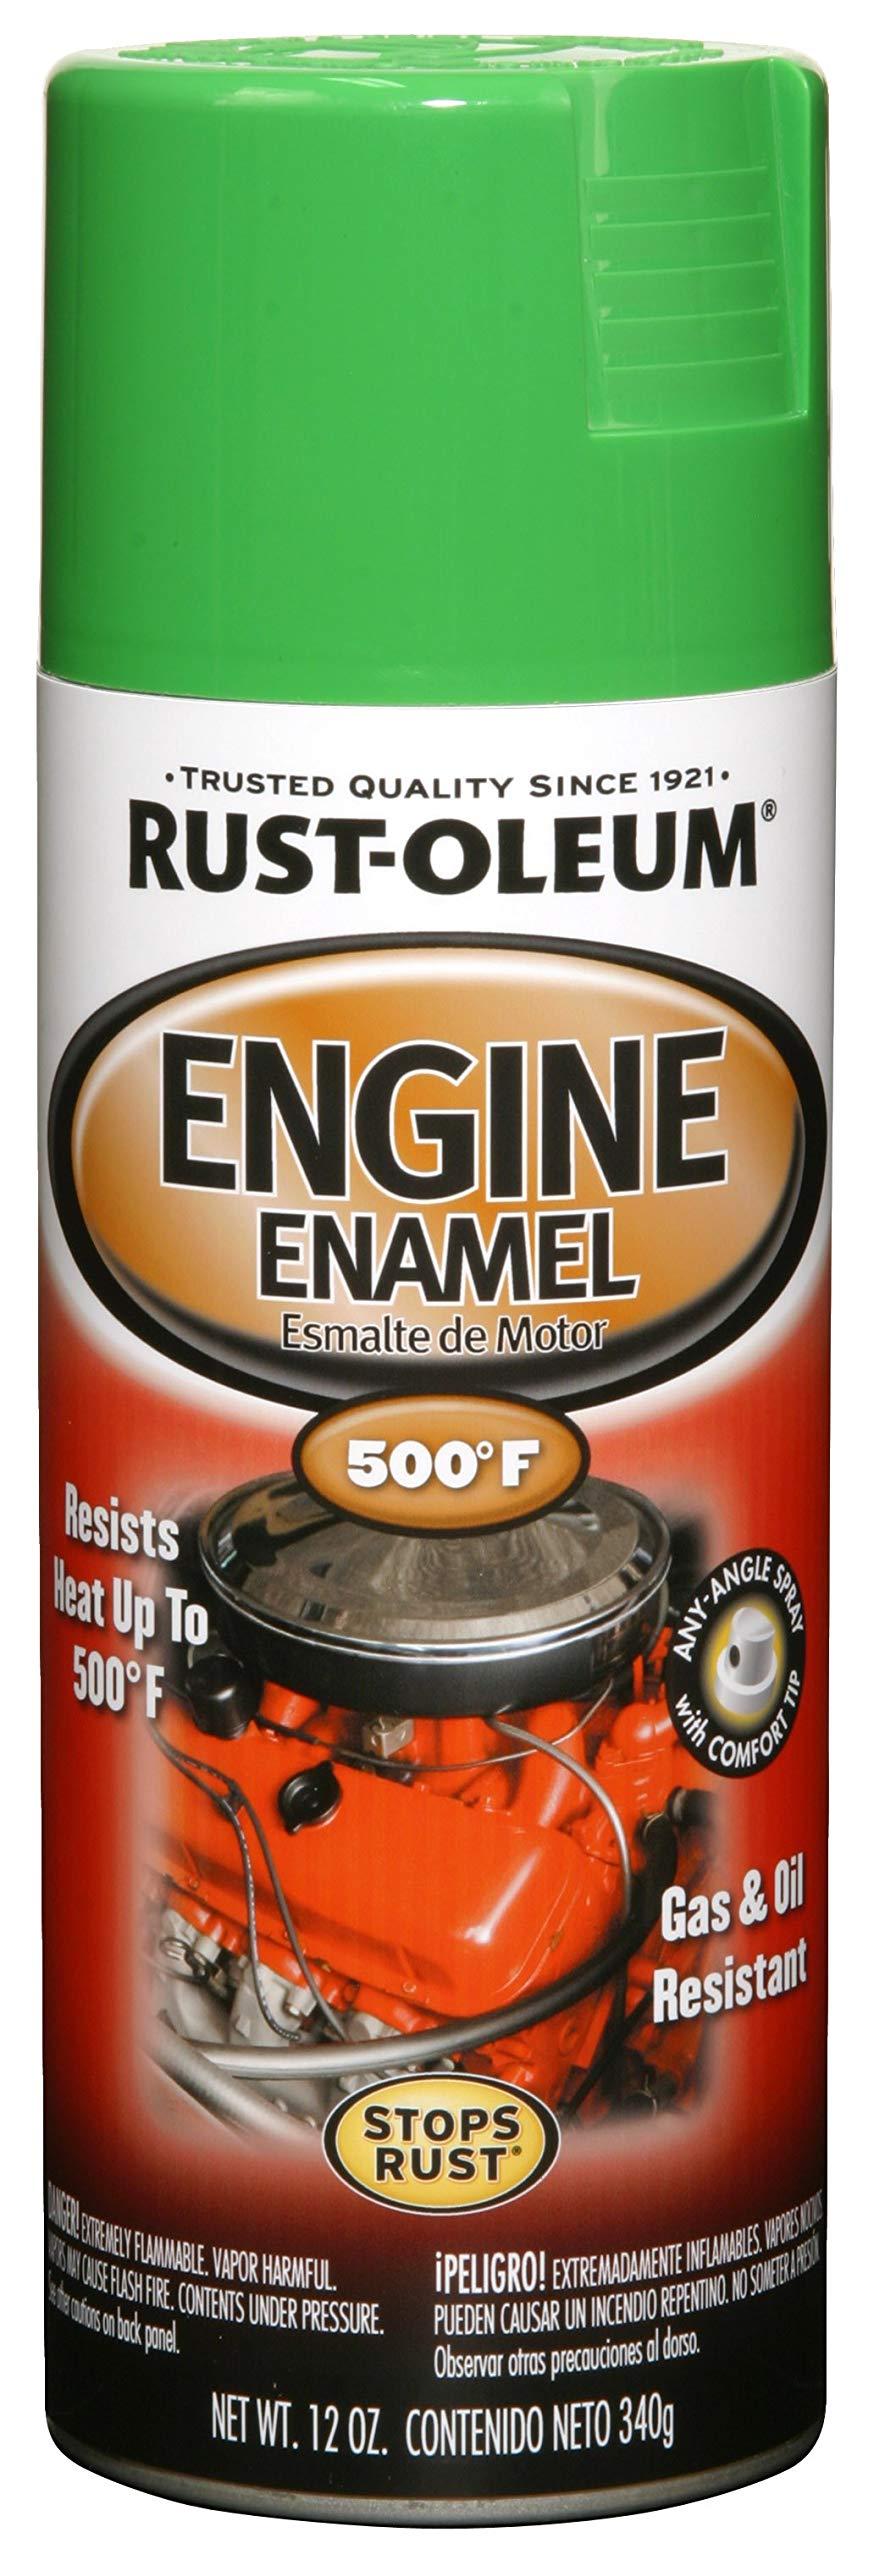 Rust-Oleum 248951, Grabber Green, 12 oz, Automotive Engine Enamel Spray Paint